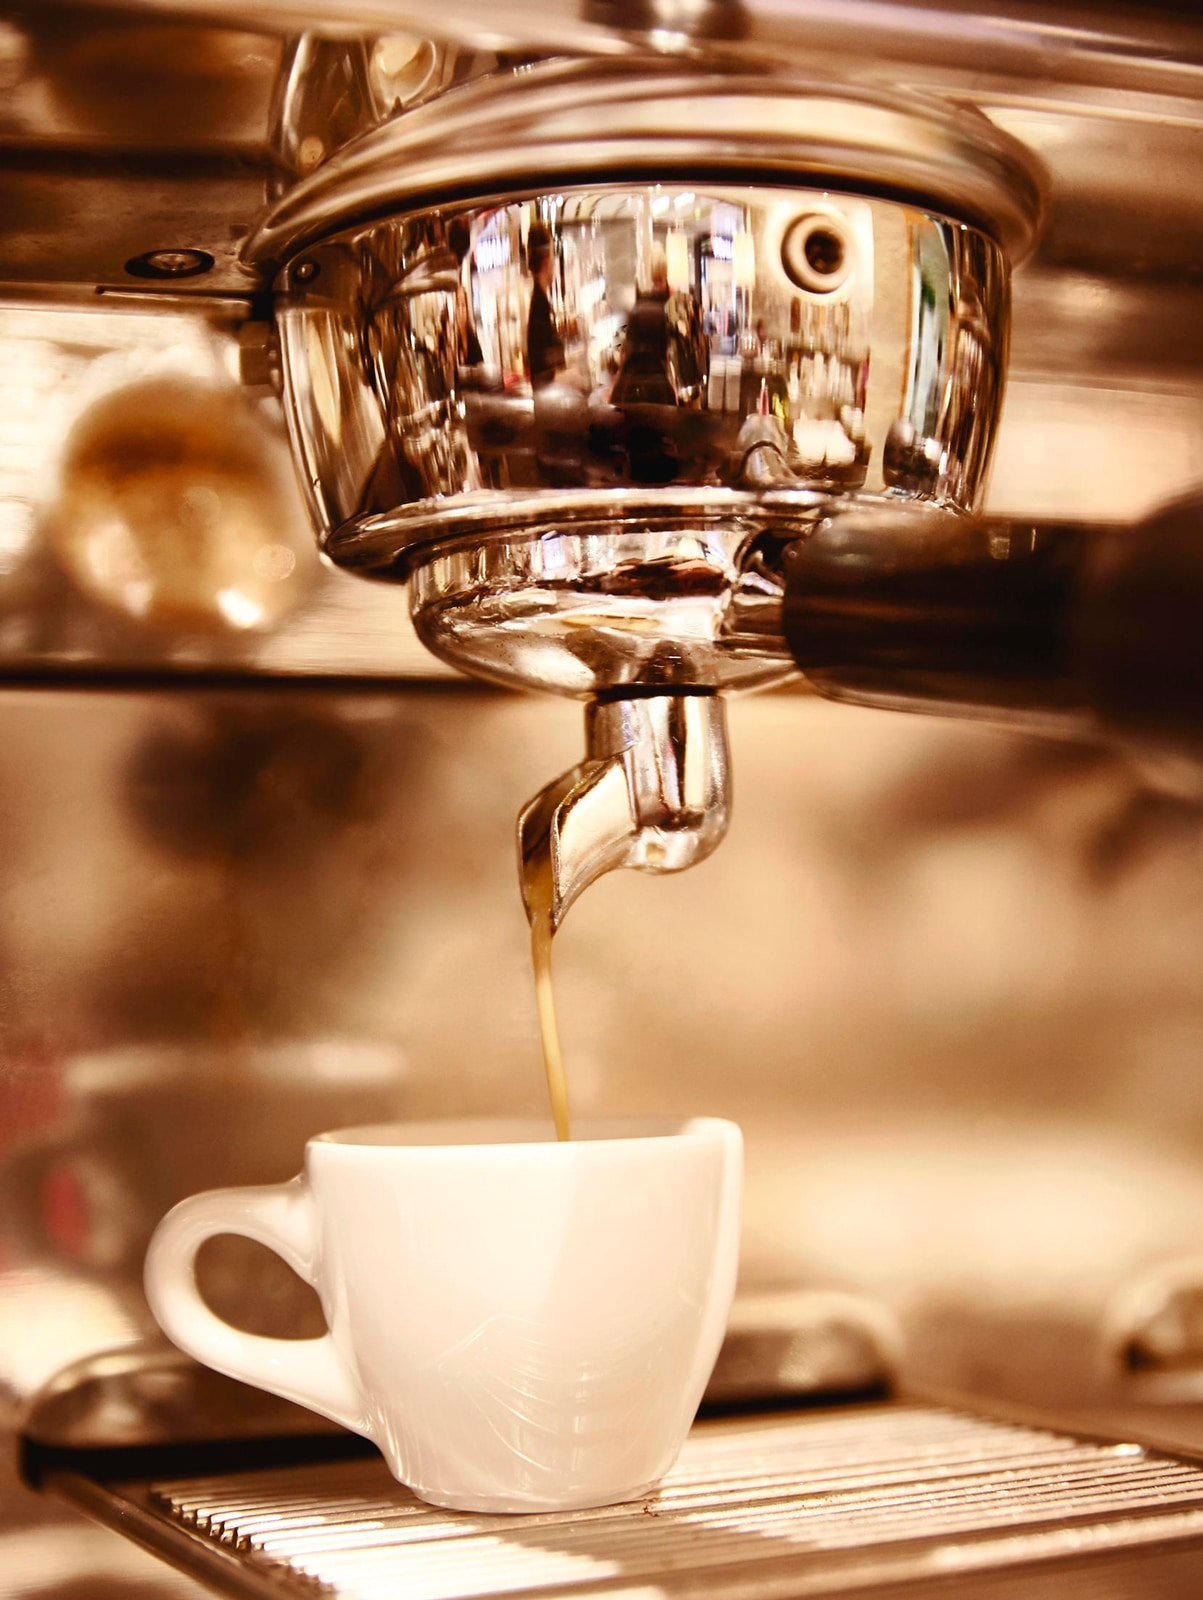 2019 08 19 5 Kaffeemaschine